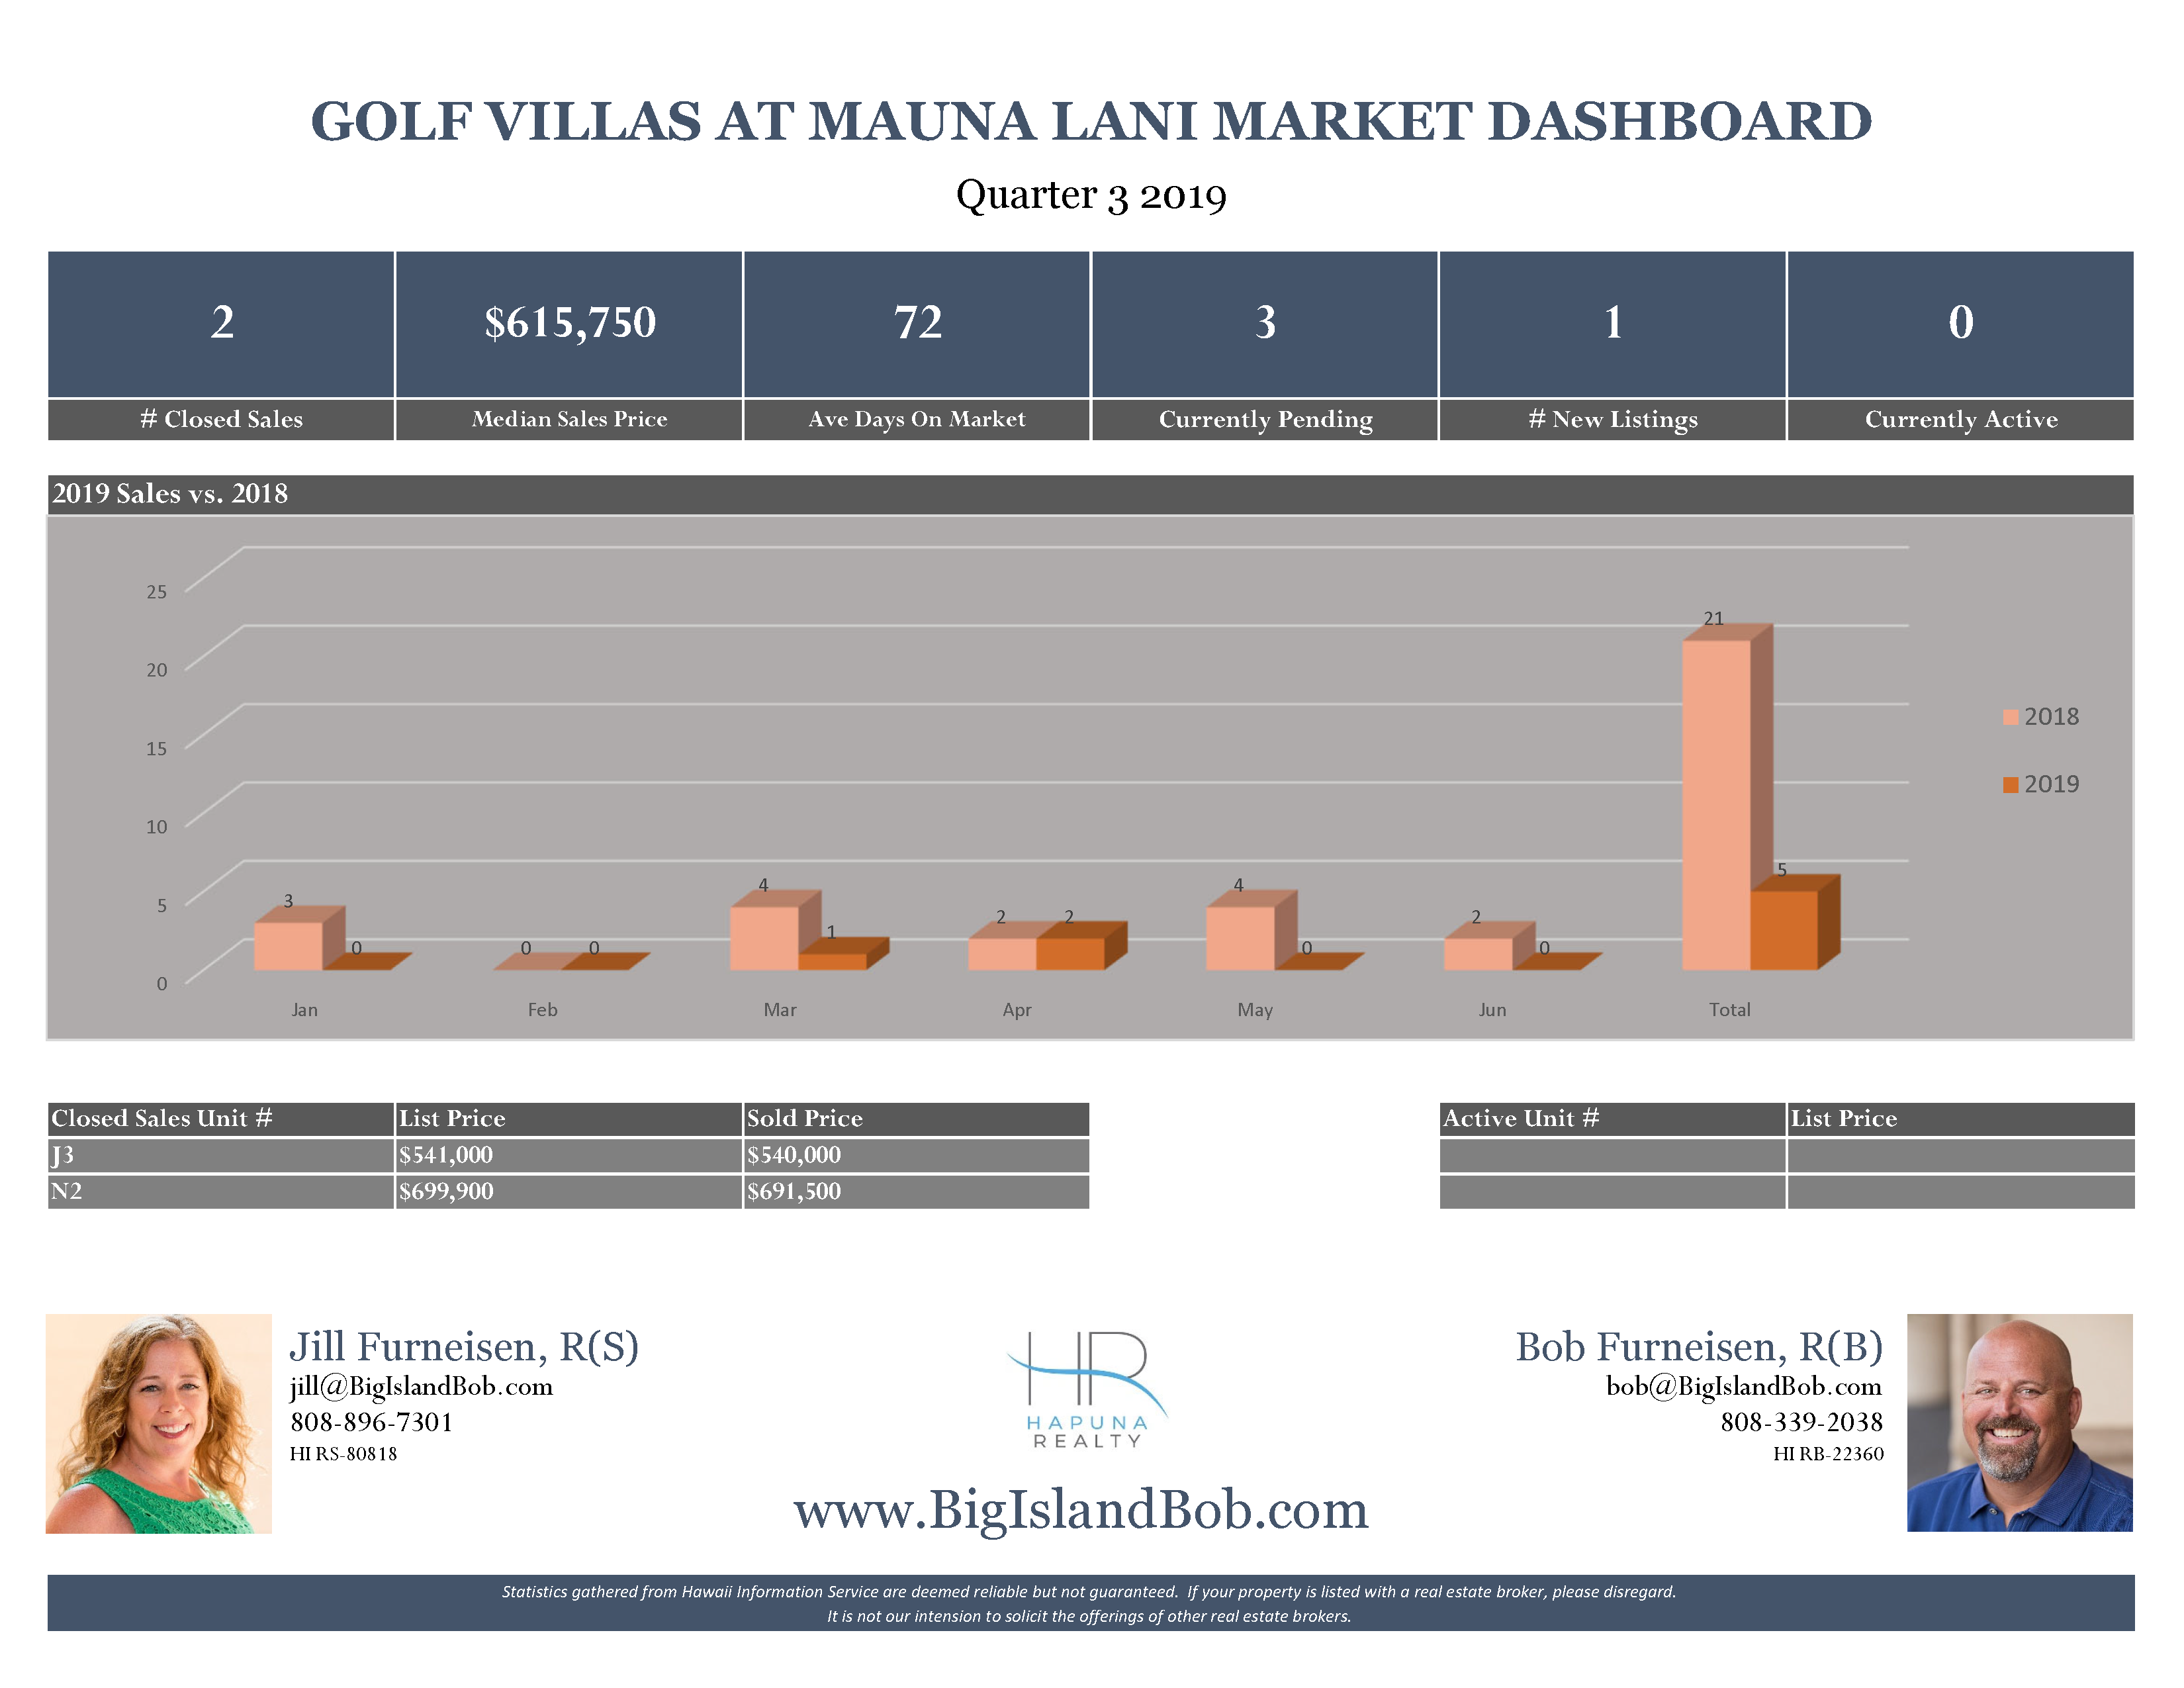 Golf Villas at Mauna Lani Quarter 3 2019 Real Estate Market Dashboard